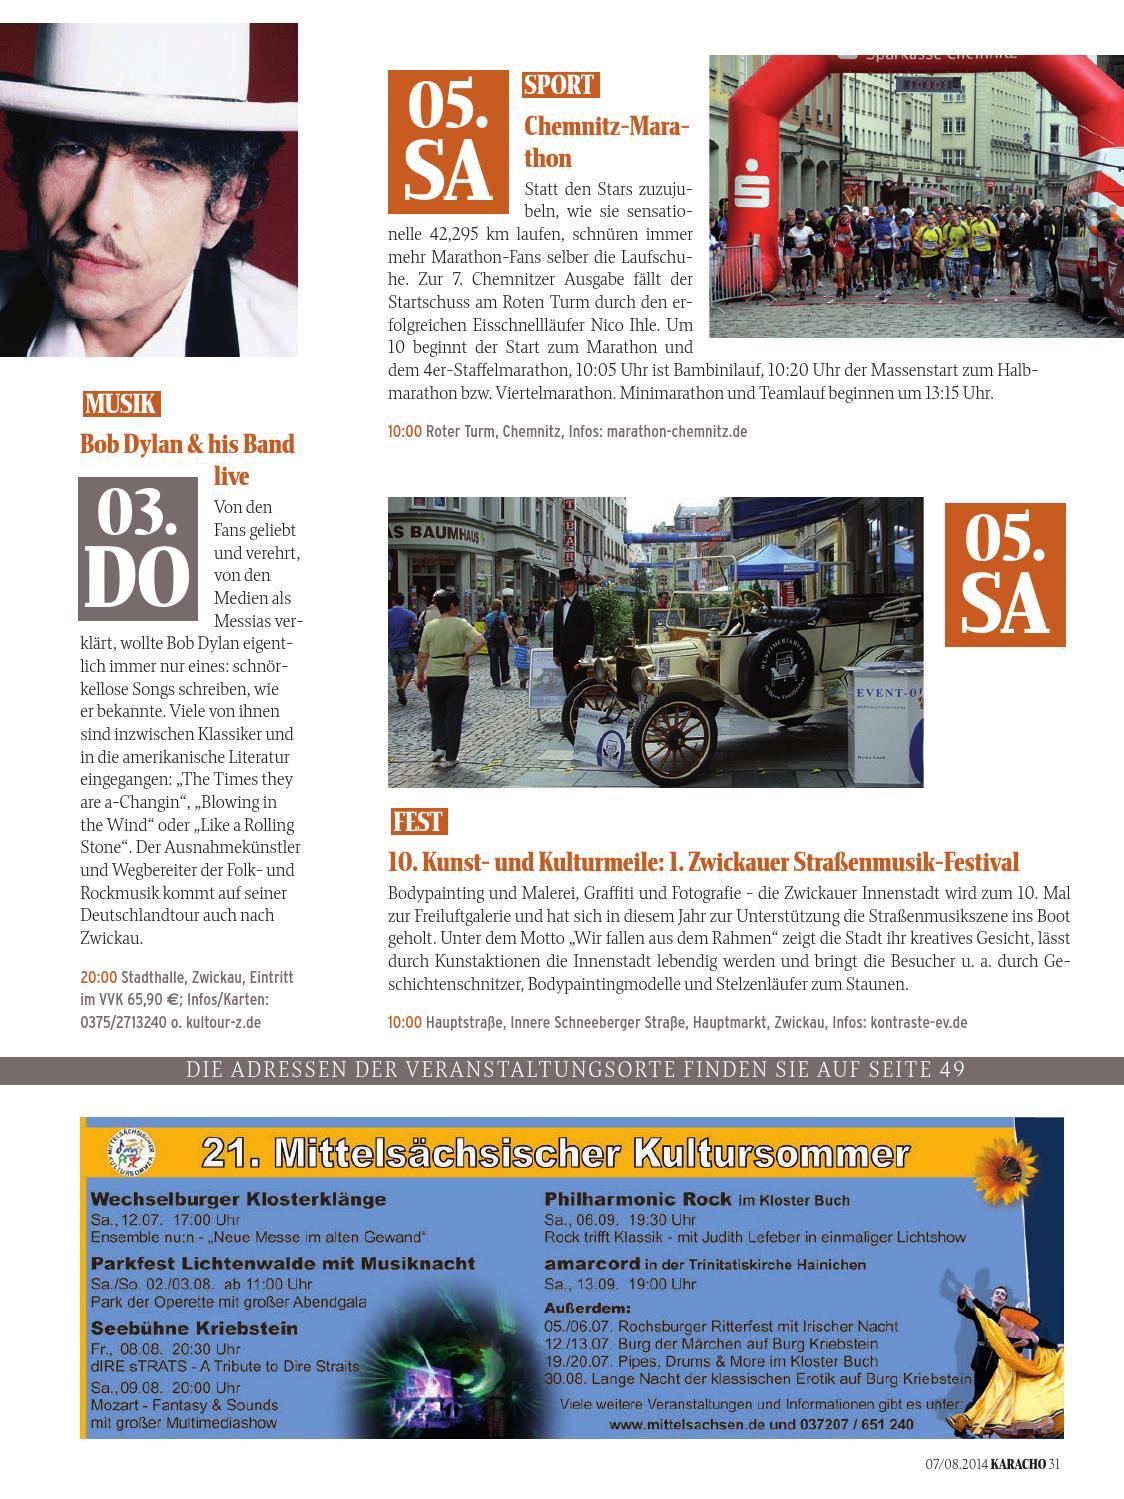 Karacho 07-08/14 by Karacho Magazin - issuu